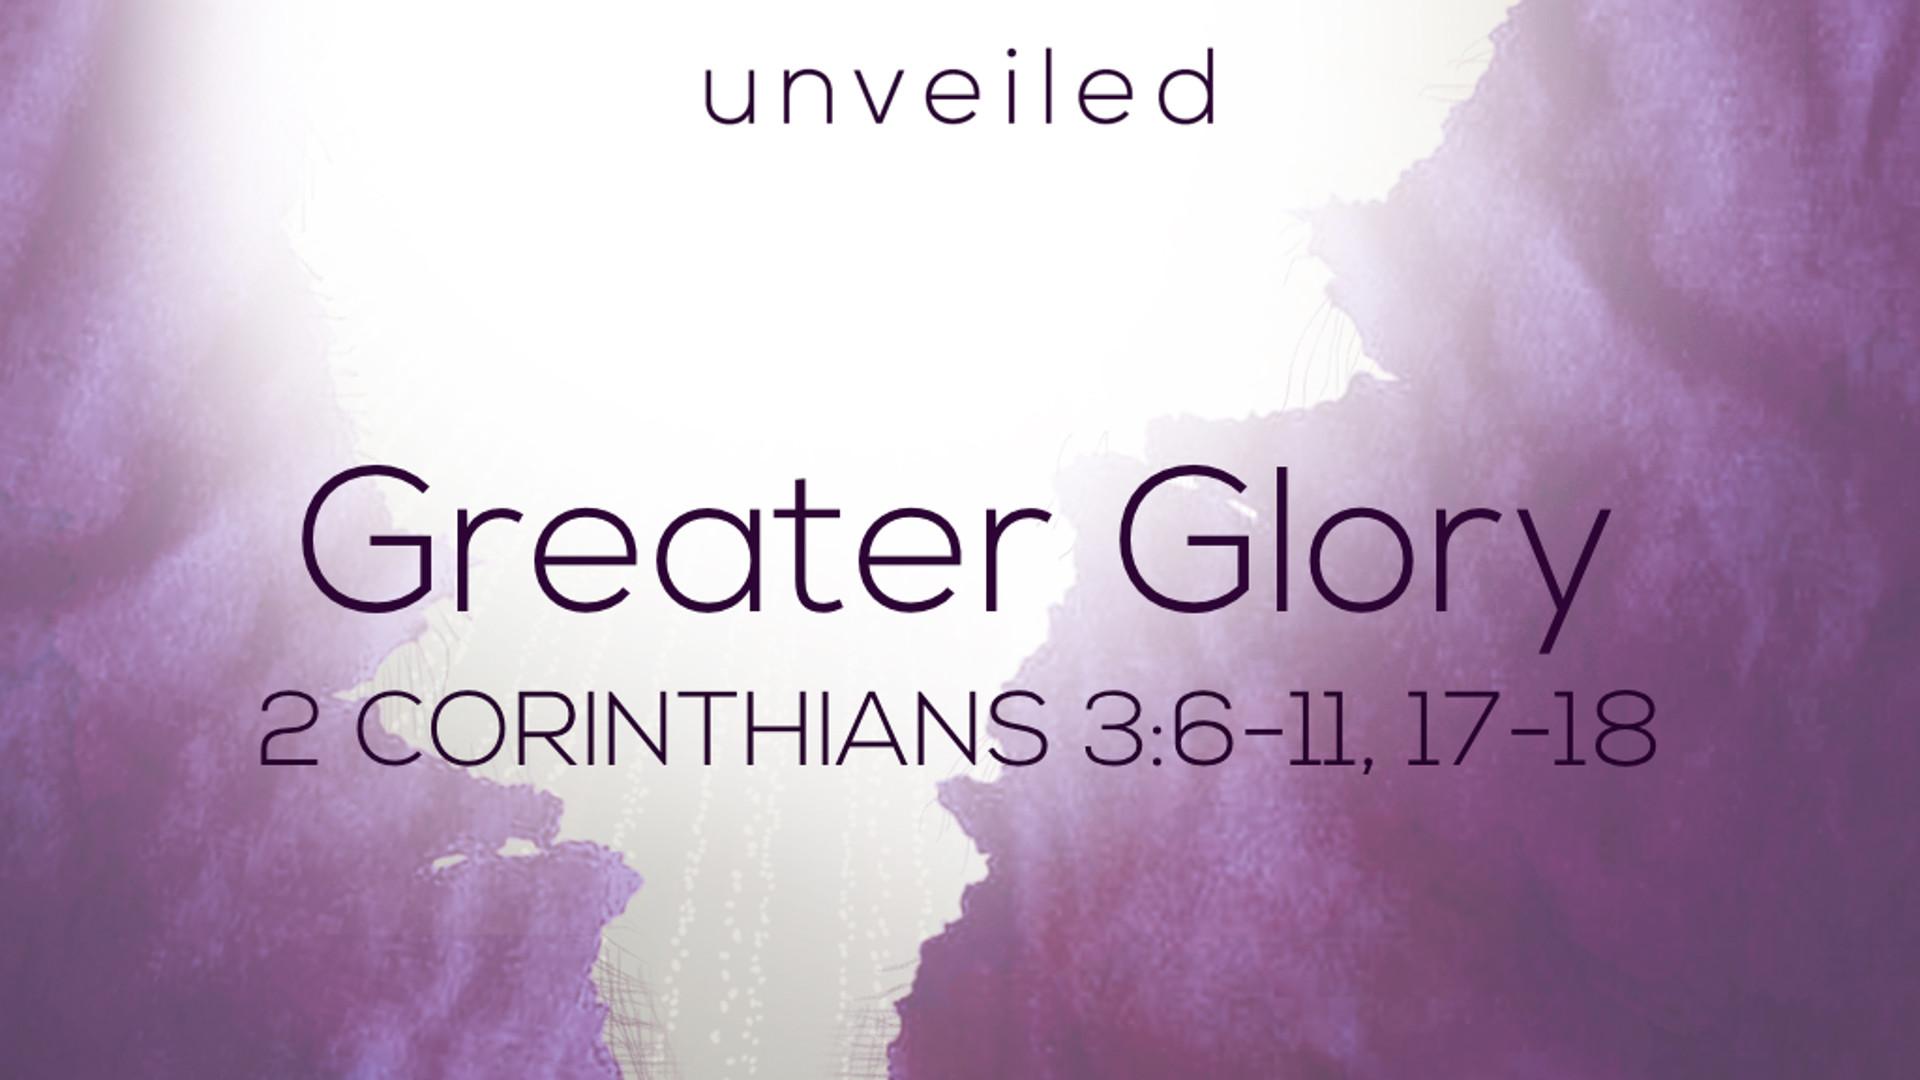 2 Cor 3.6-11, 17-18 - Greater Glory.jpg